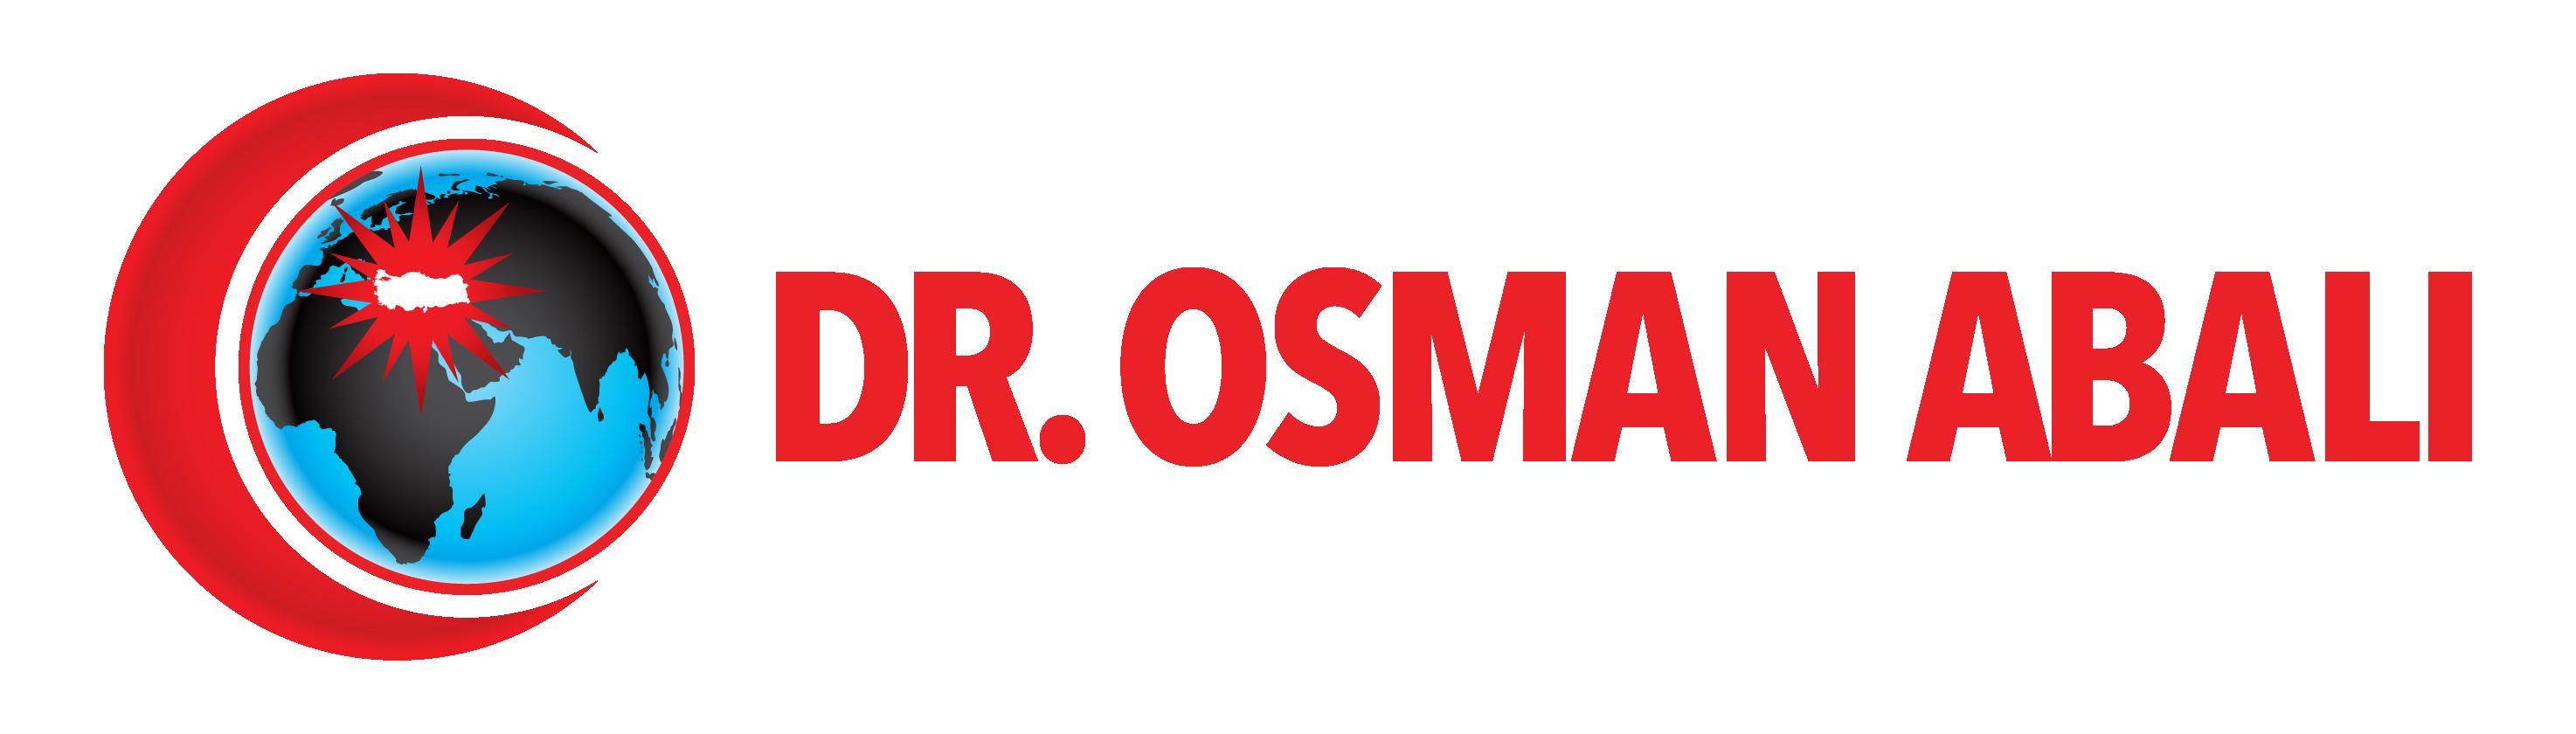 DR OSMAN ABALI LOGO